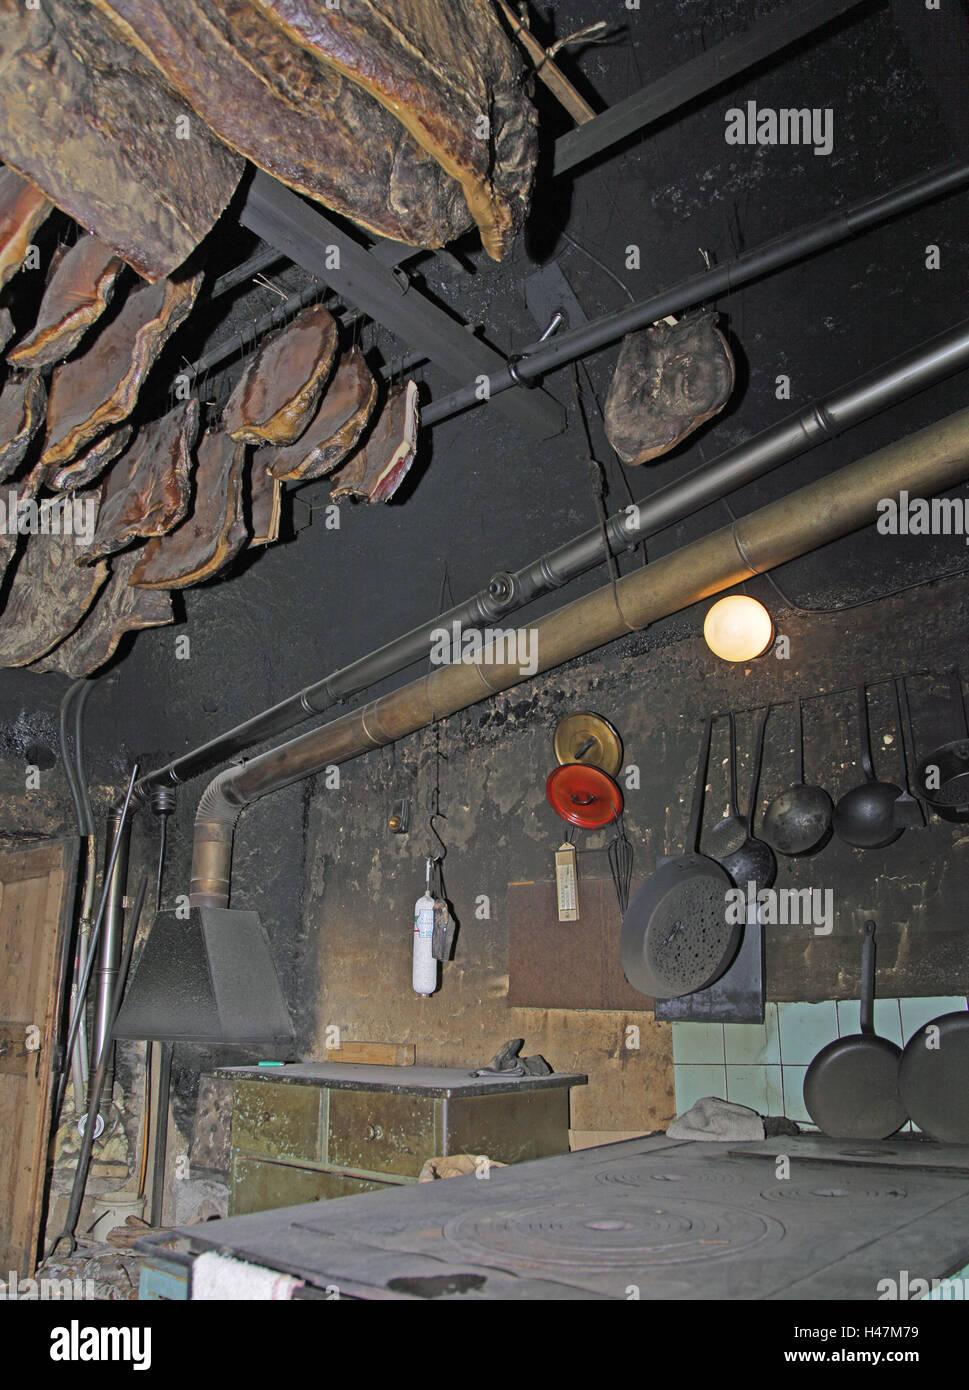 Smoke cuisine, old, ham, hangs, Italy, South Tyrol, Ultental, Ulten, cuisine, focus, kiln, iron, iron, hearthstone, - Stock Image